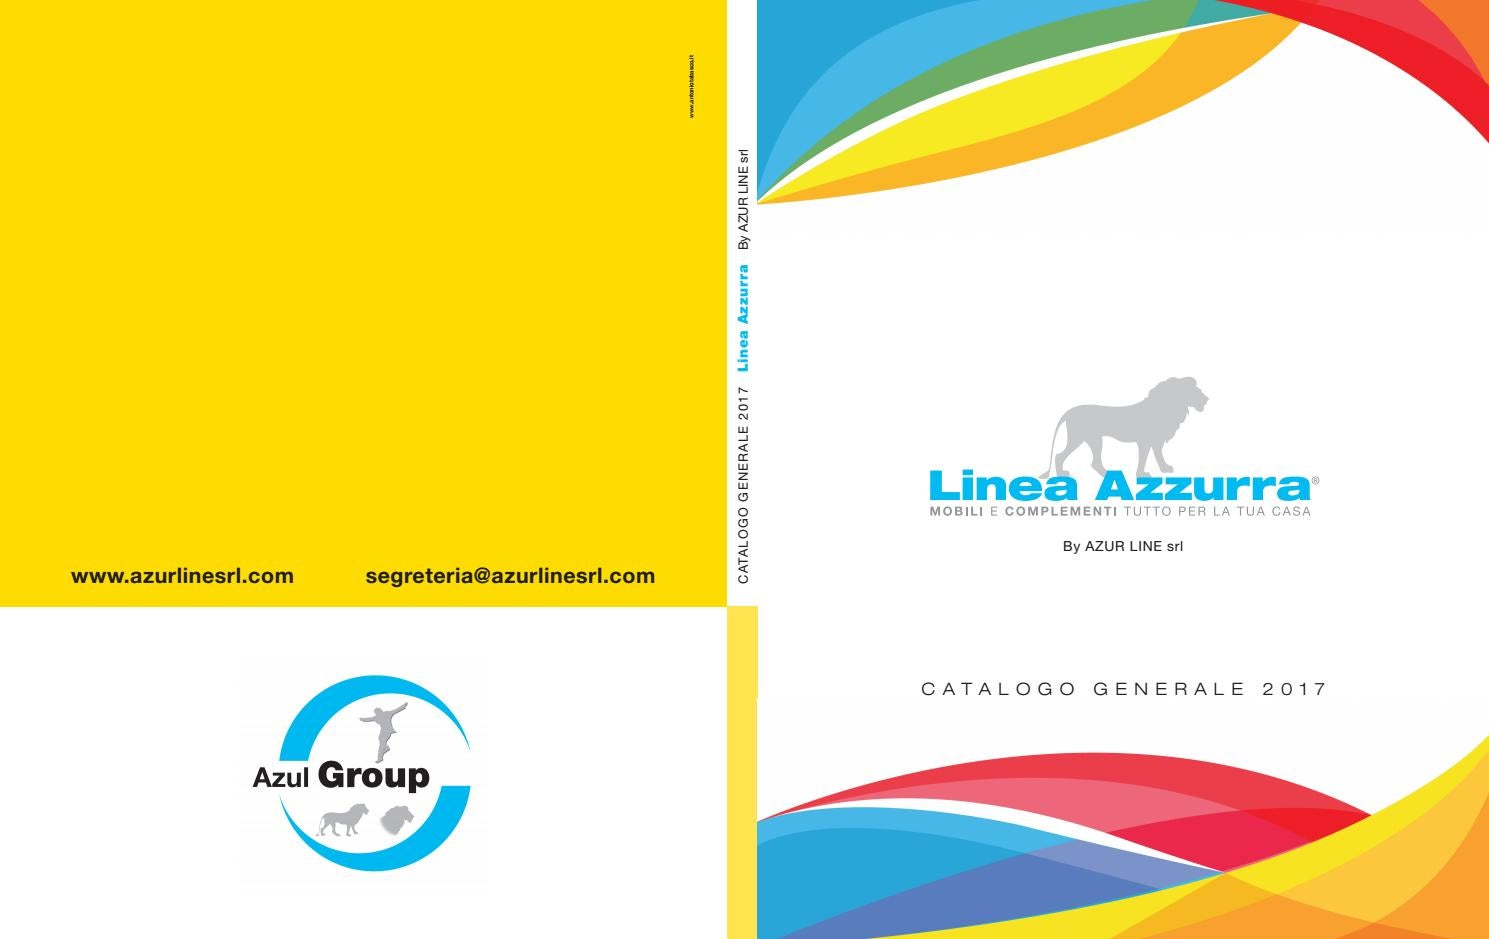 Catalogo fabbrica mobili azur line napoli by azur line s r l issuu - Linea azzurra mobili ...